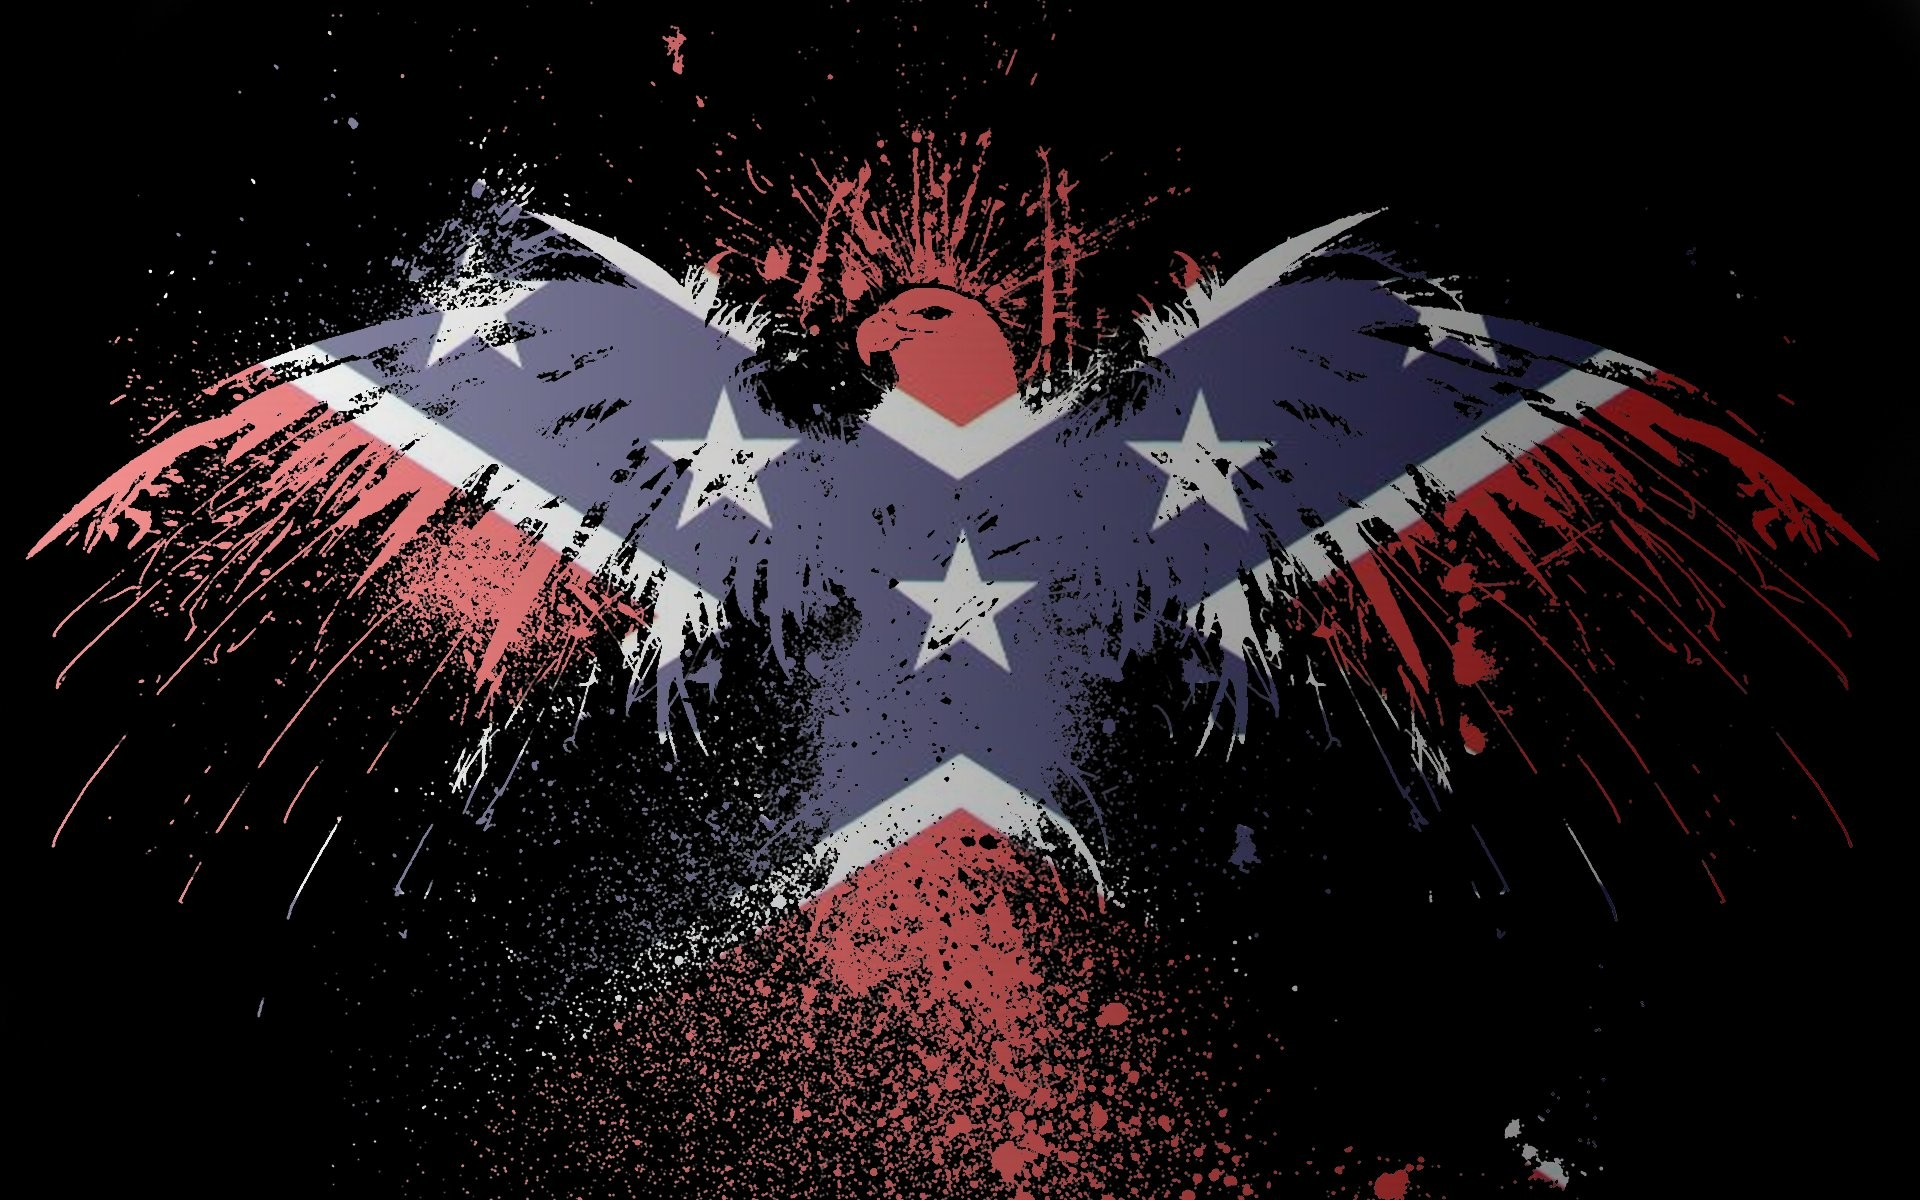 CONFEDERATE flag usa america united states csa civil war rebel dixie  military poster wallpaper     742419   WallpaperUP